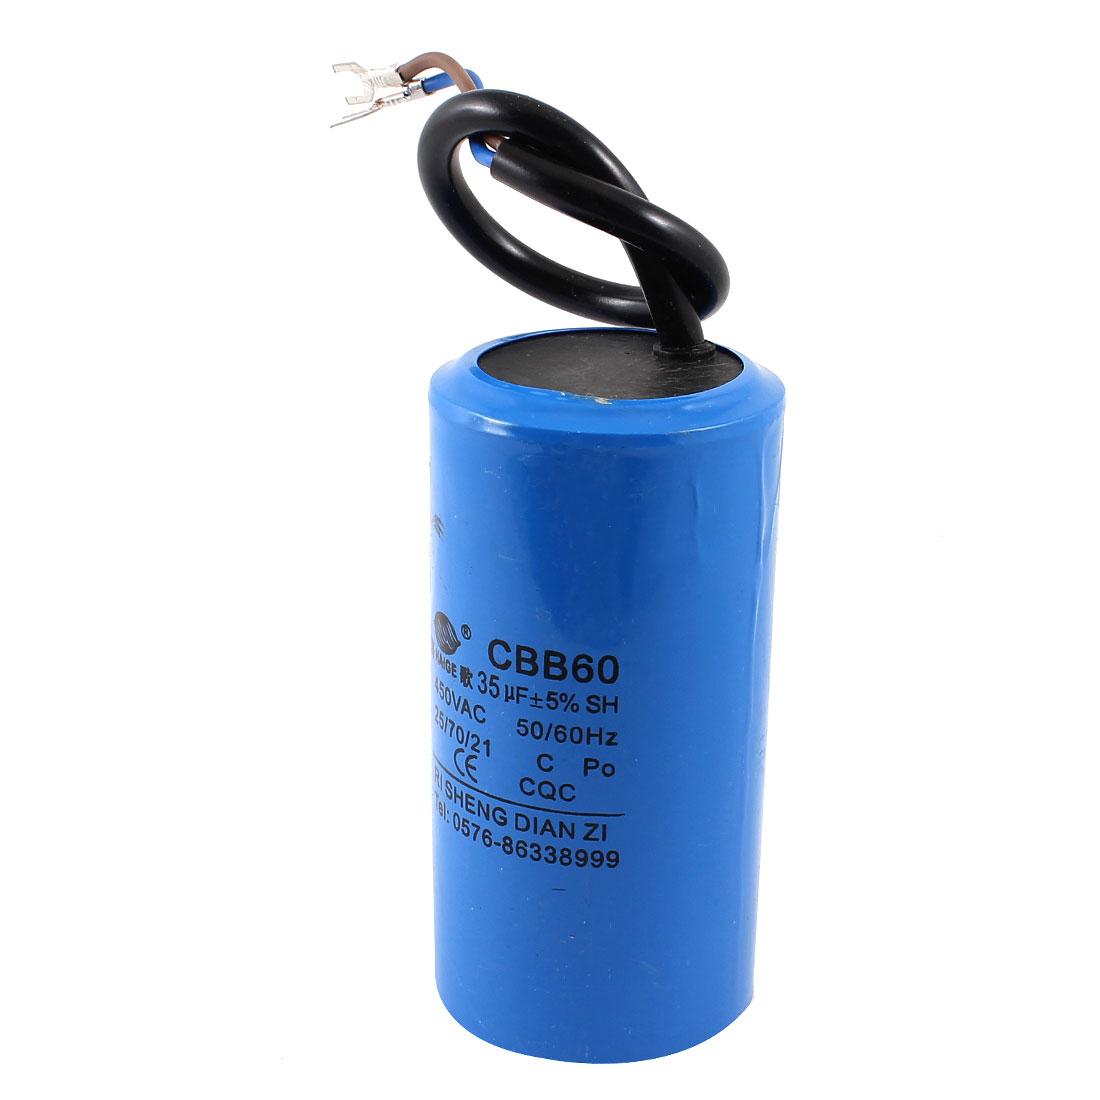 CBB60 AC 450V 35uF 50/60 Hz Polypropylene Film Motor Run Capacitor